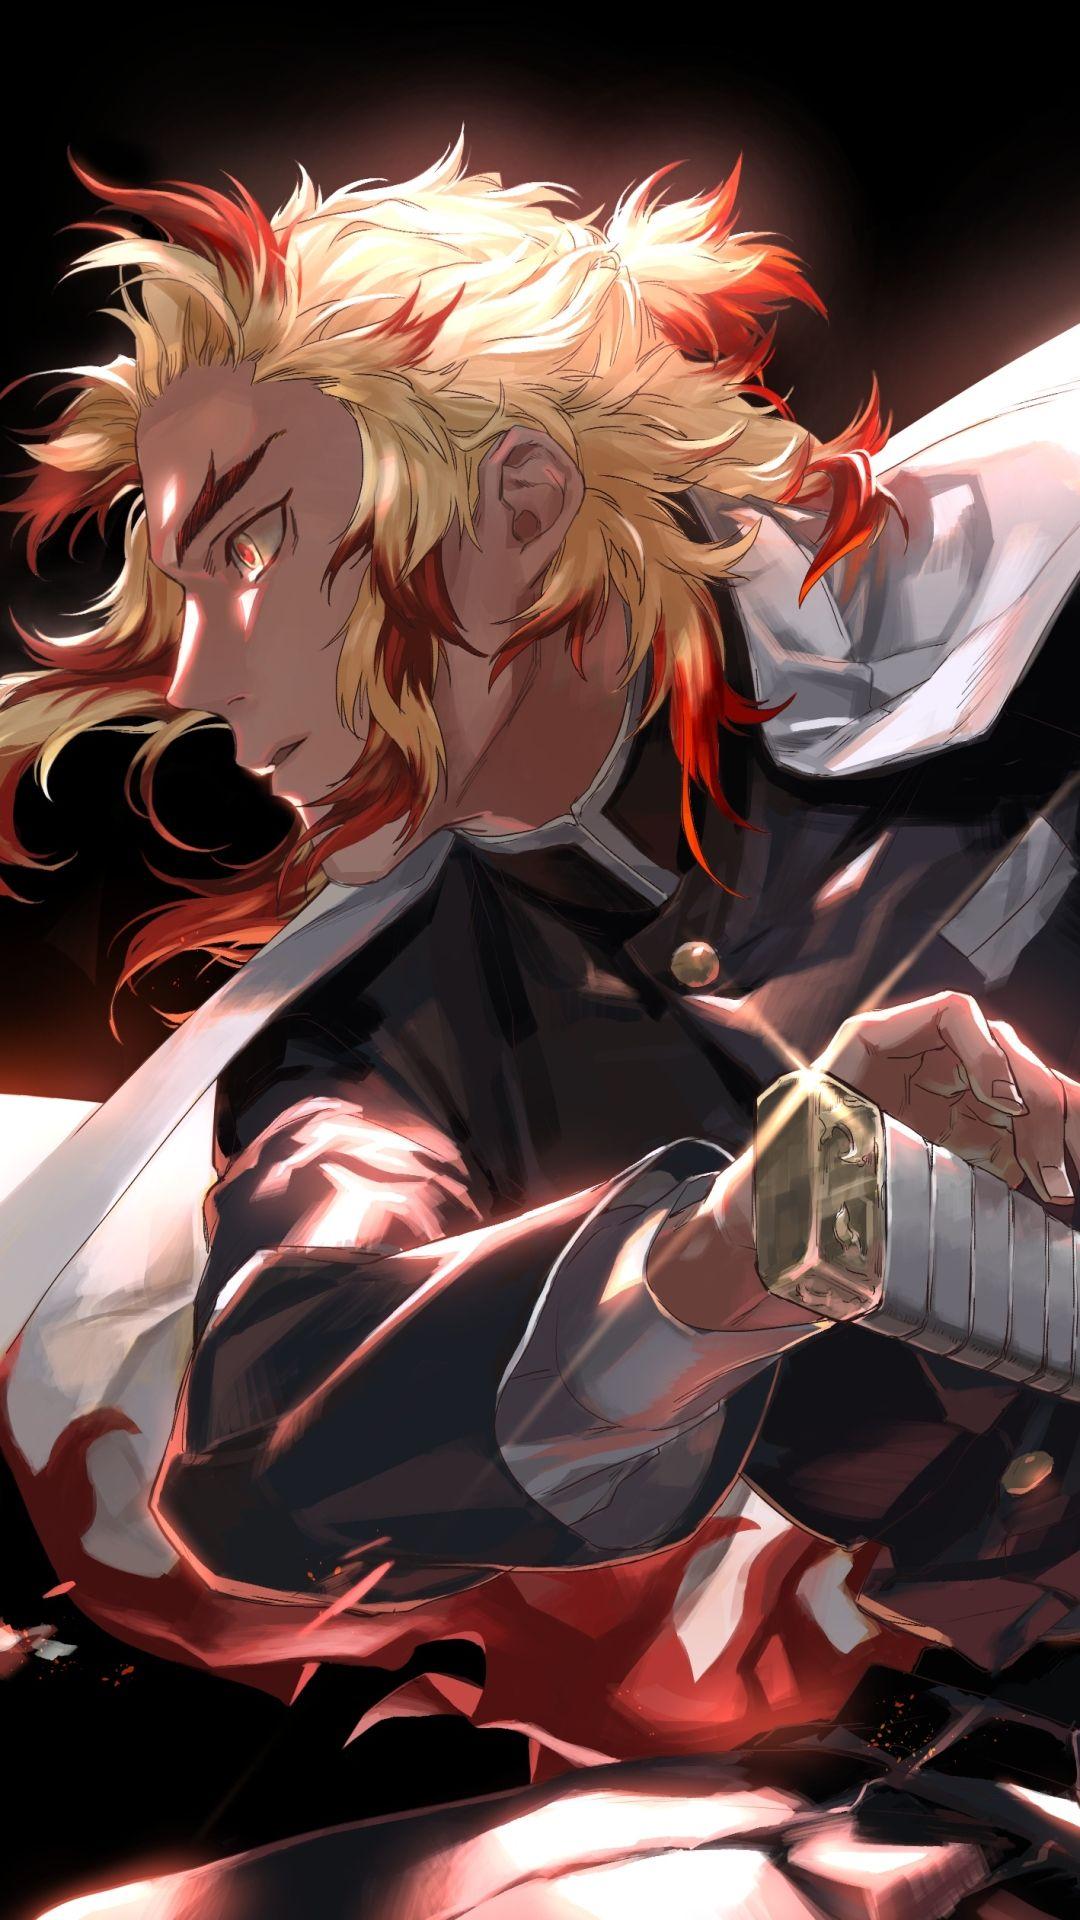 Kimetsu No Yaiba Wallpaper Hd Portrait Anime Demon Slayer Anime Anime Wallpaper